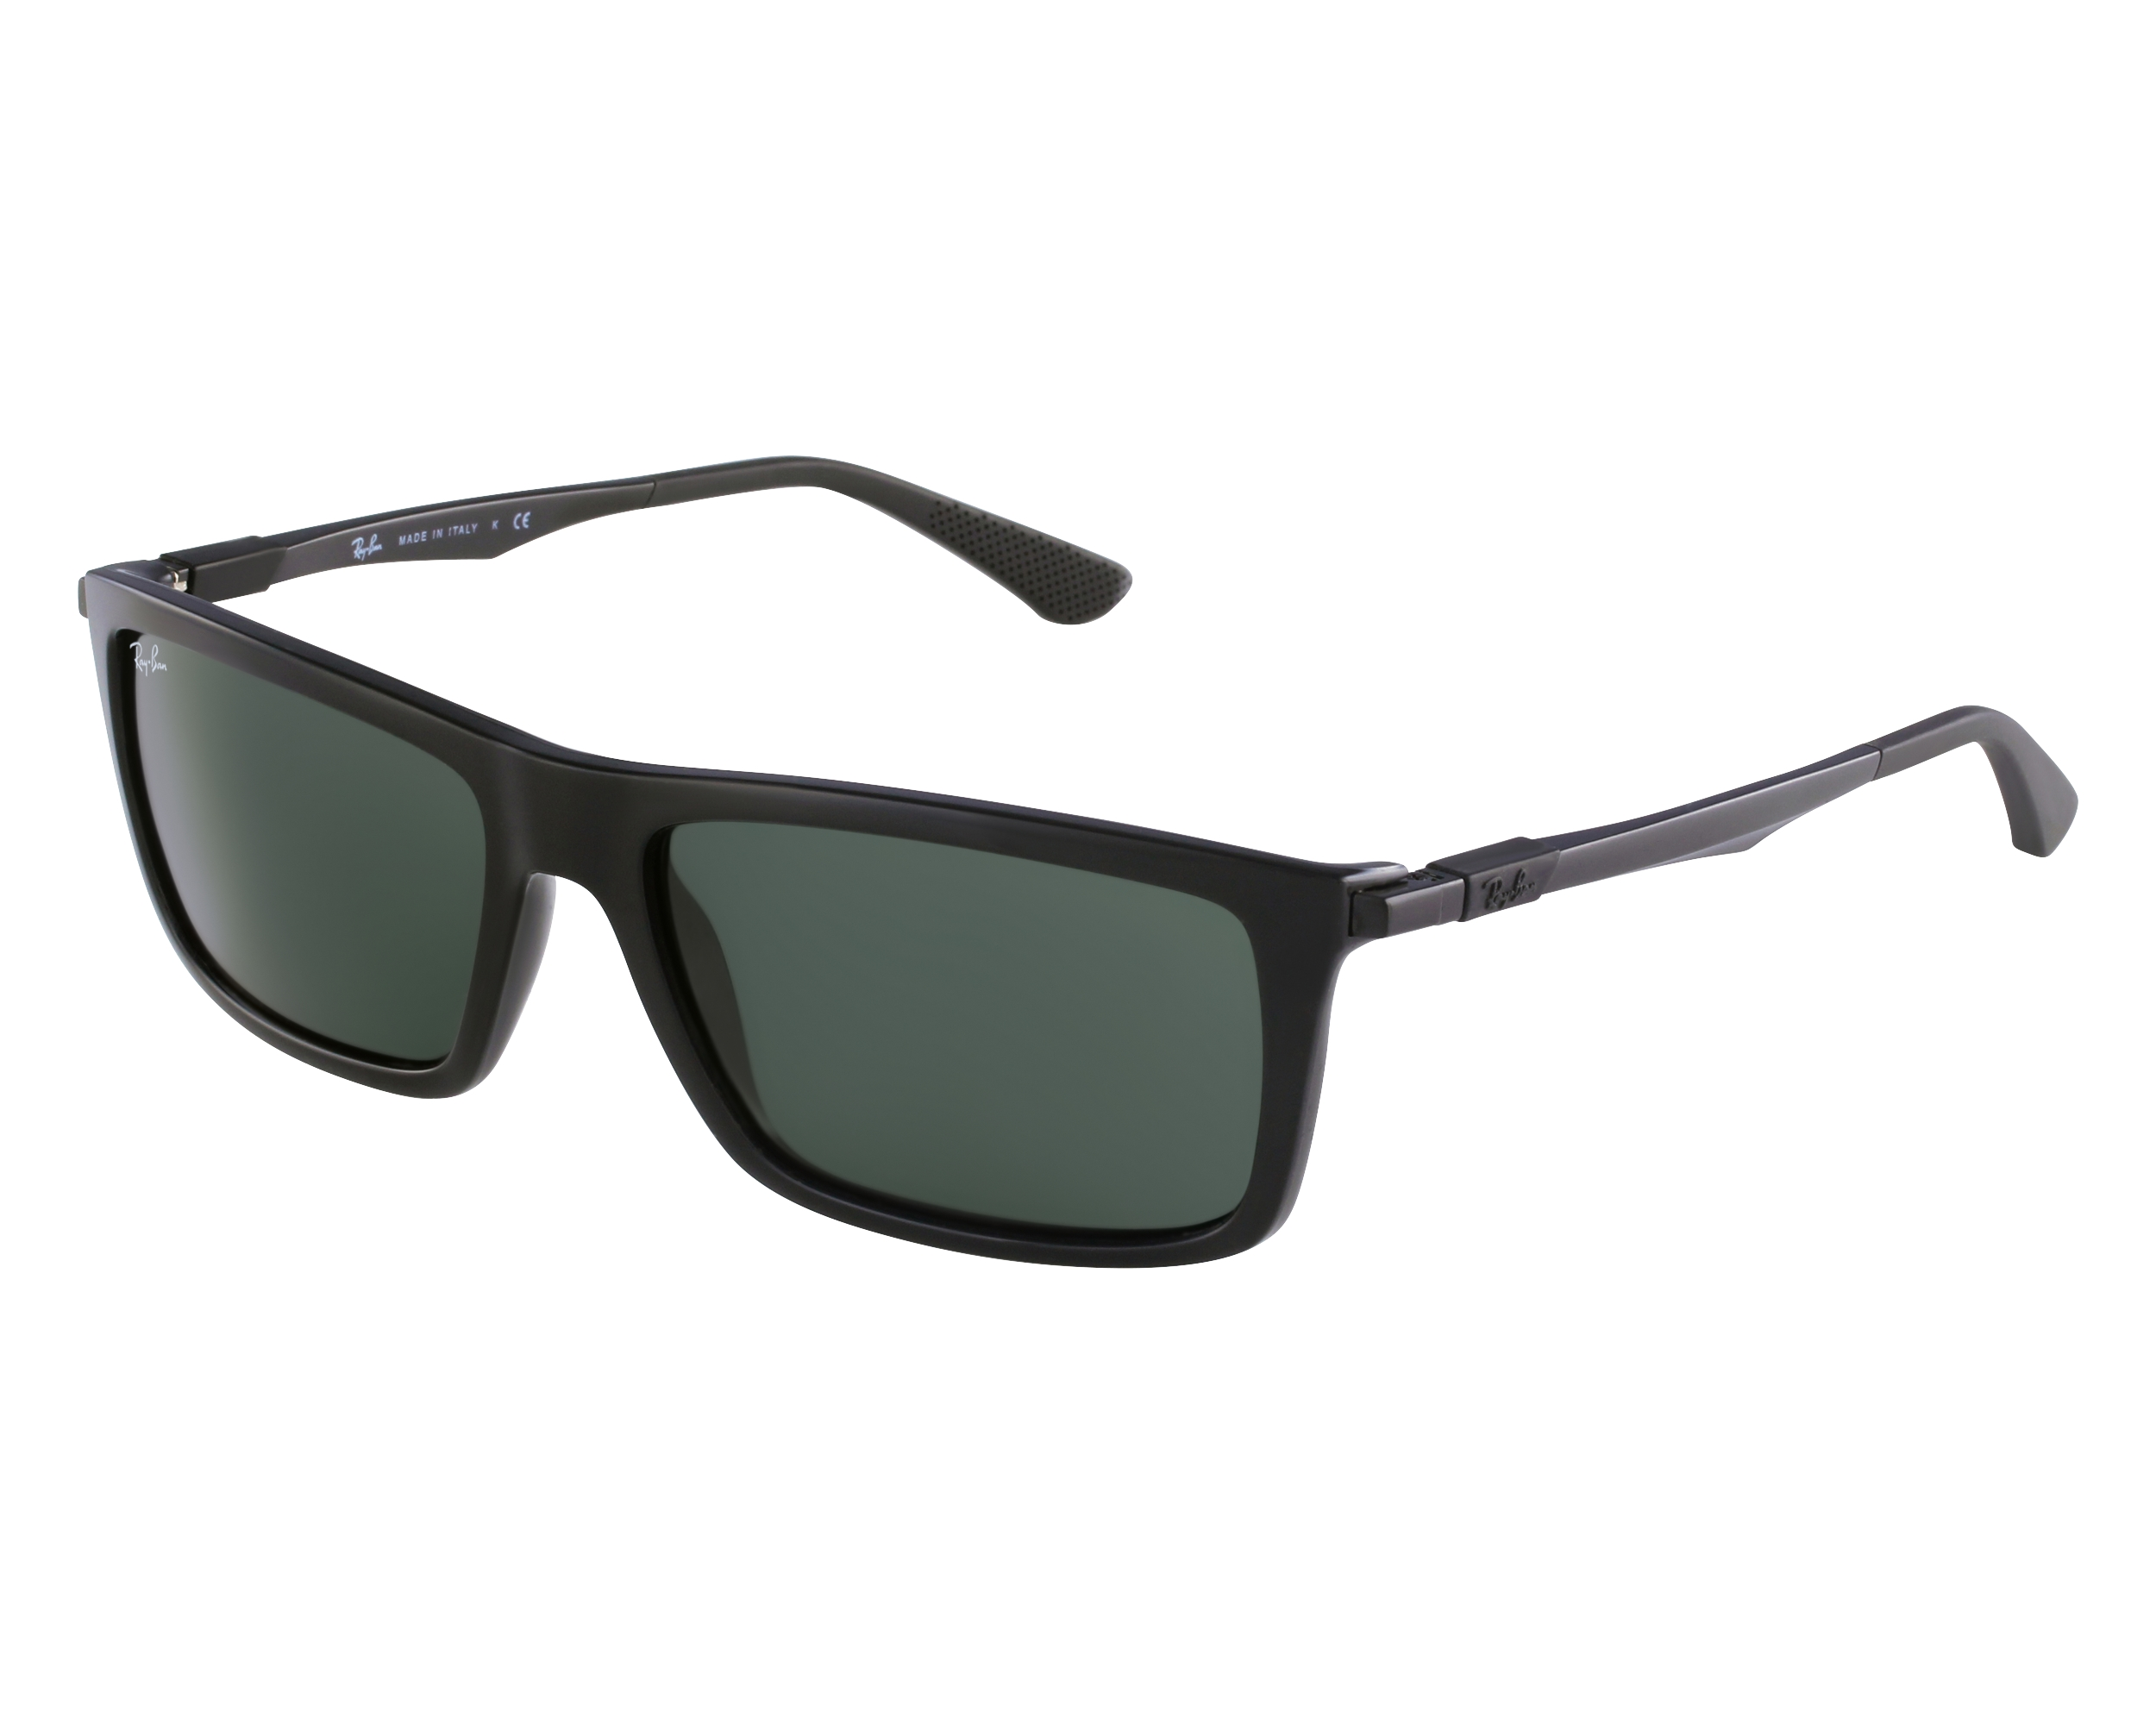 727a005f15 thumbnail Sunglasses Ray-Ban RB-4214 601 71 - Black Black front view